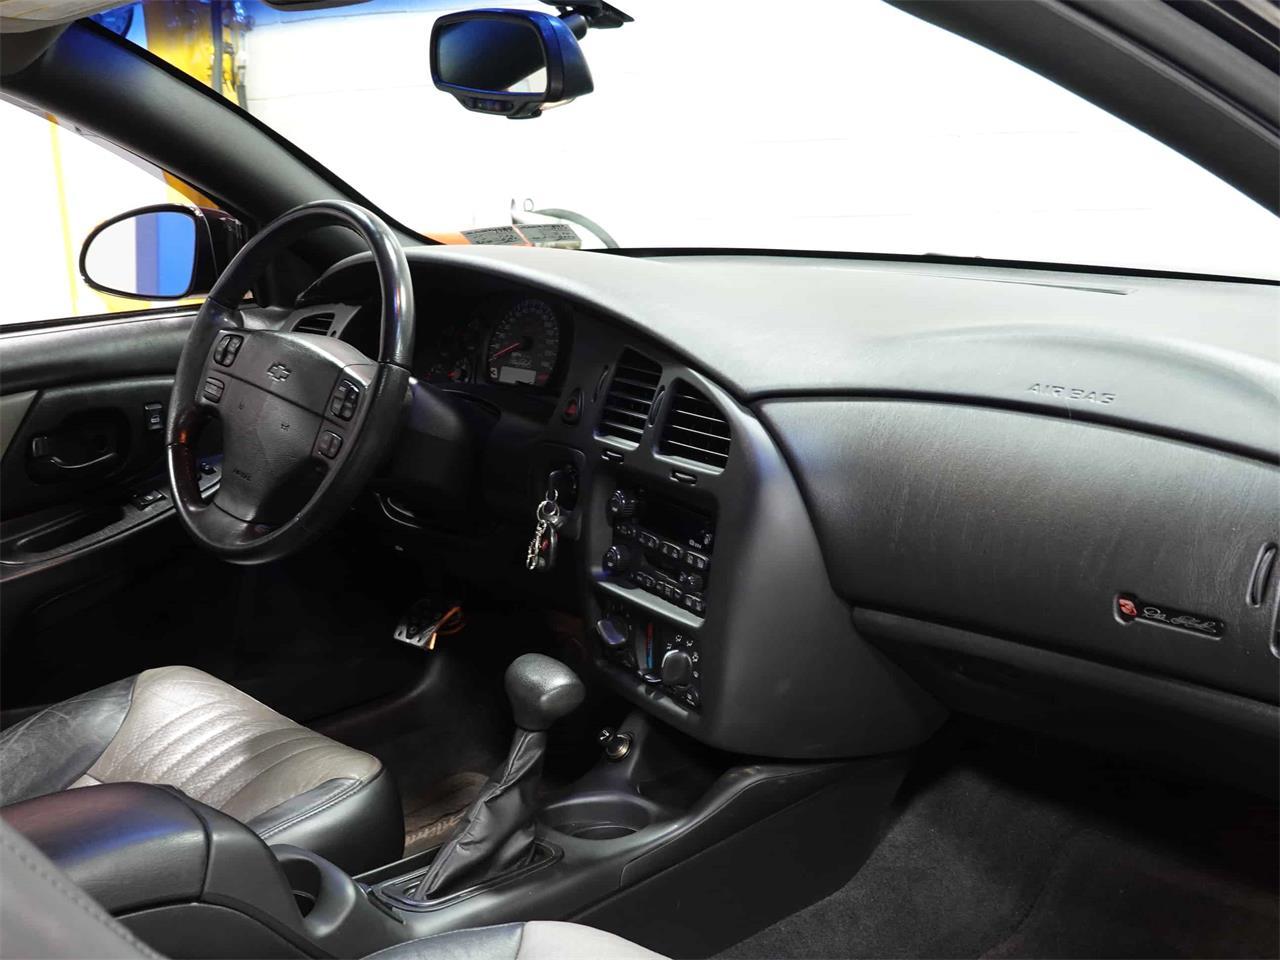 2002 Chevrolet Monte Carlo (CC-1382949) for sale in Pittsburgh, Pennsylvania